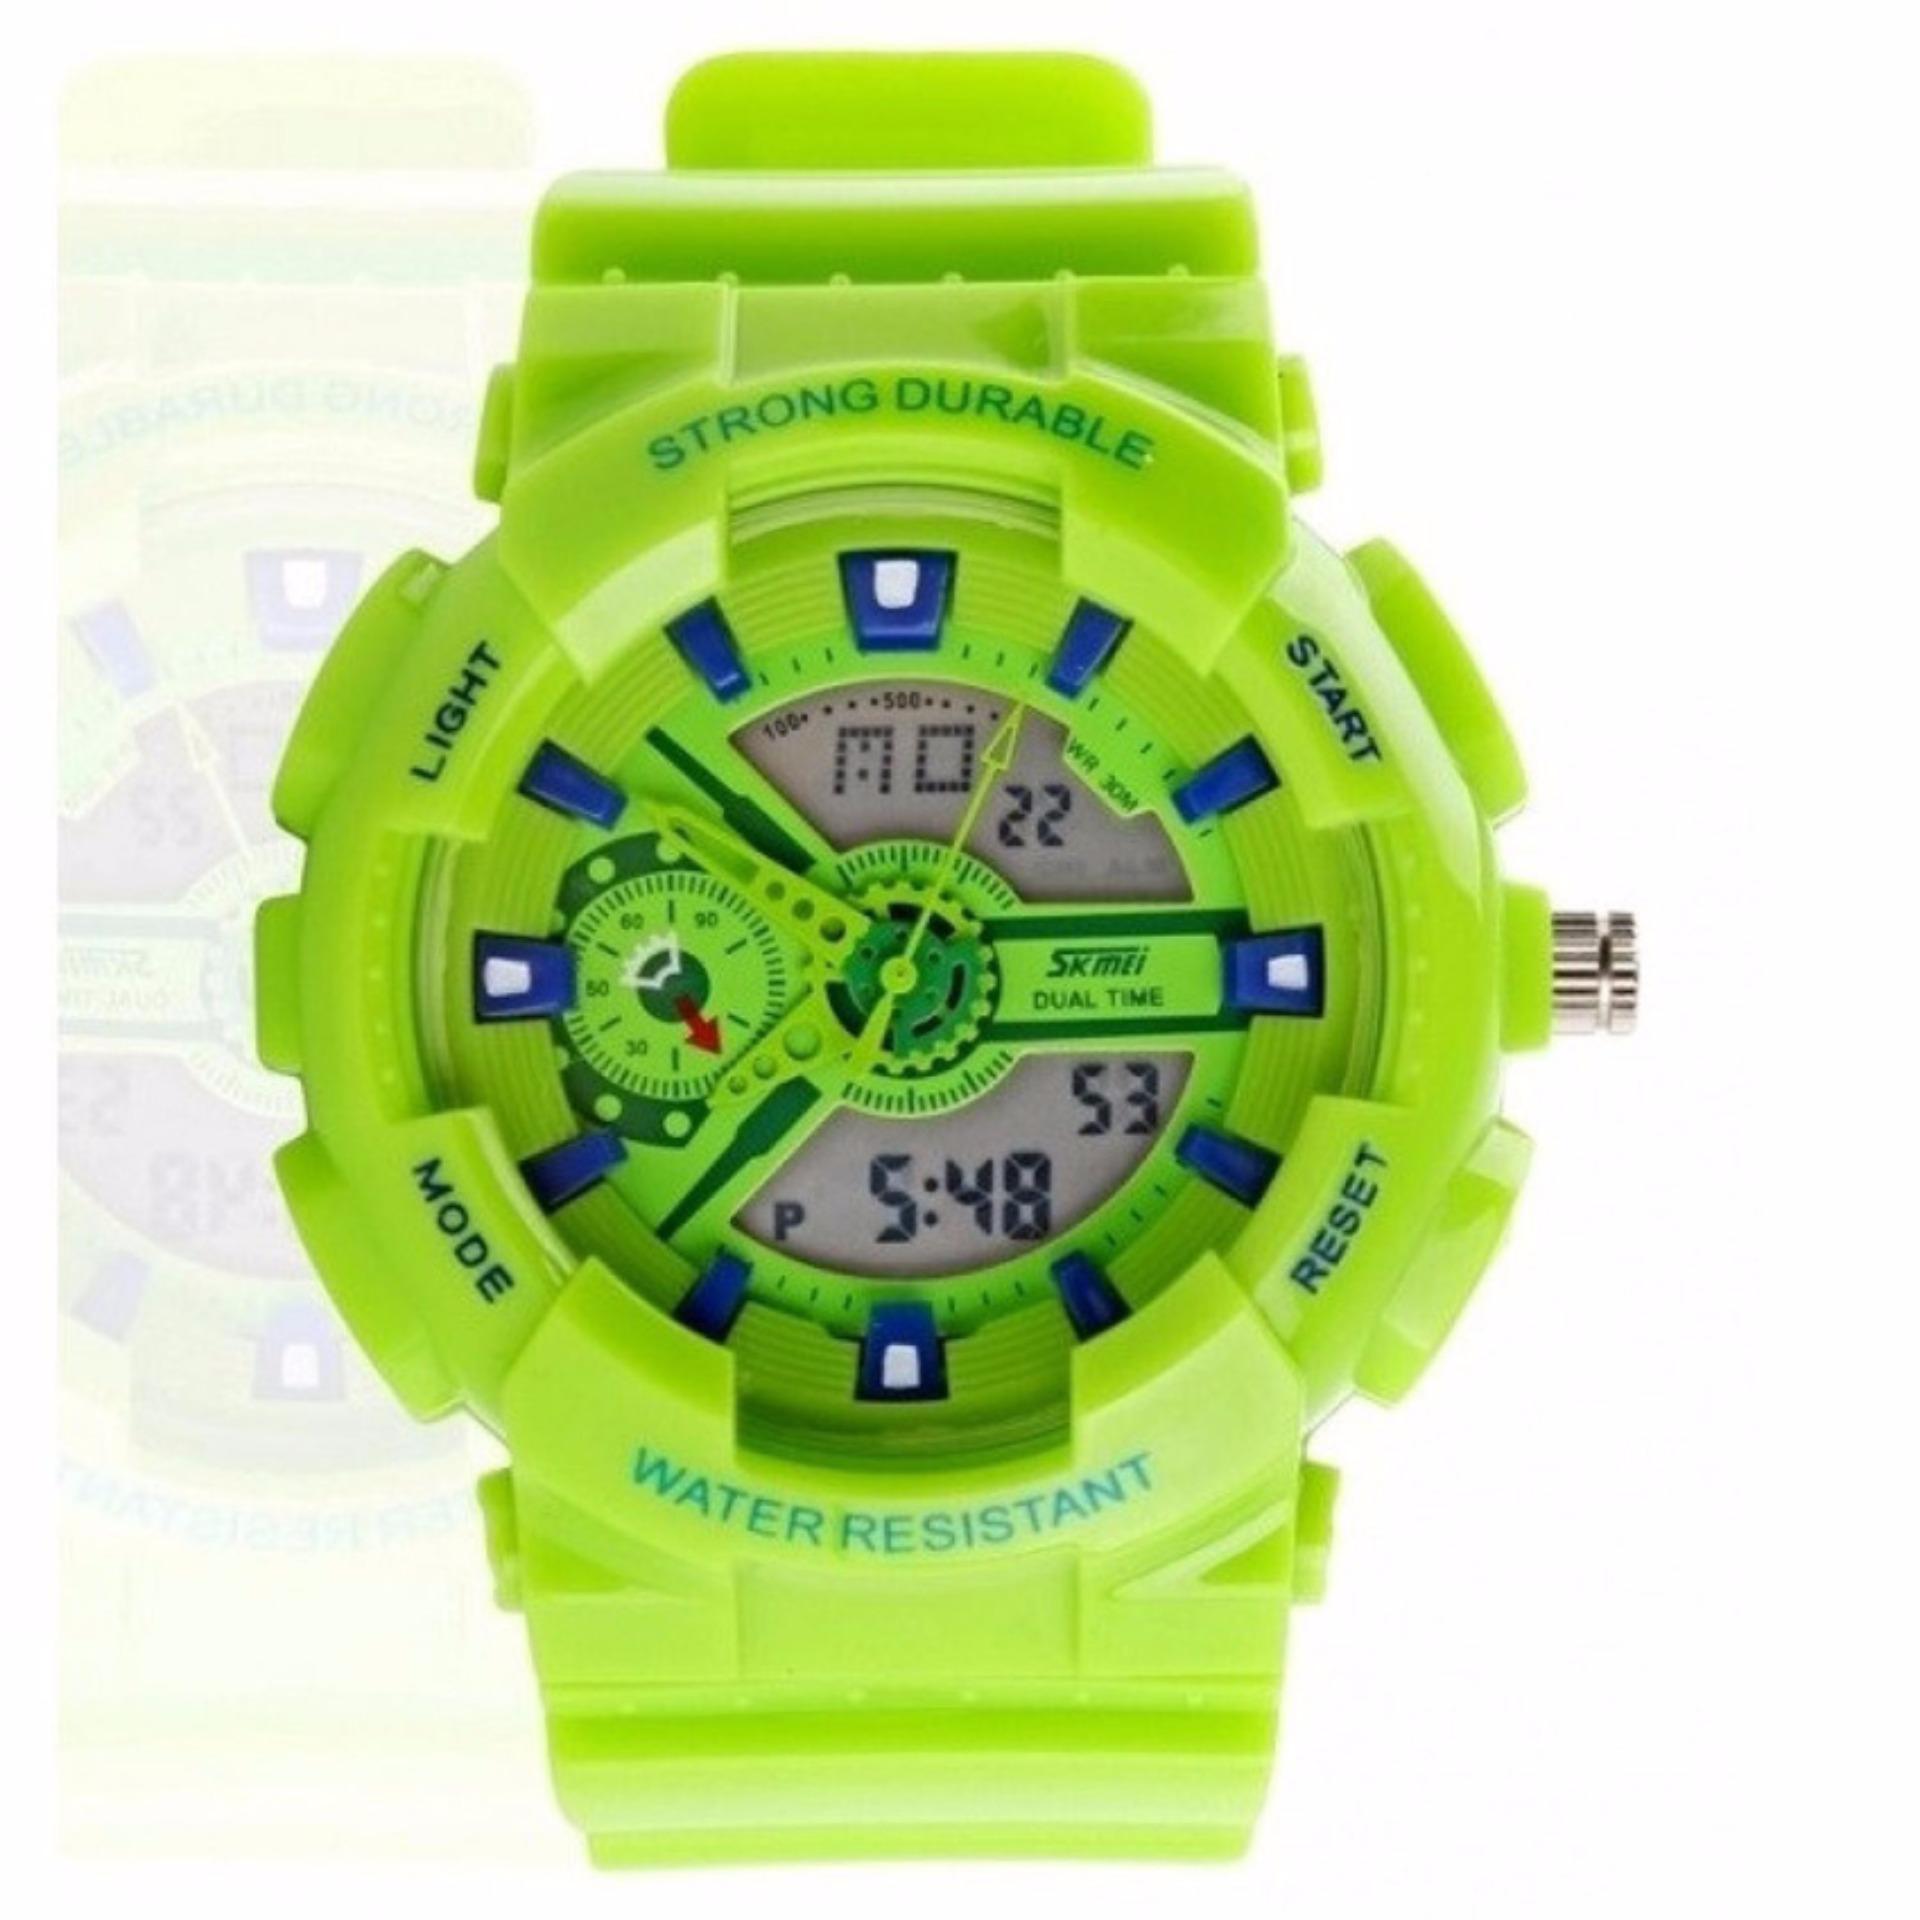 SKMEI S-Shock Sport Men LED Anti Air Water Resistant WR 50m AD0929 Jam Tangan Pria Tali Strap Karet Day Date Digital Alarm Wristwatch Wrist Watch Fashion ...